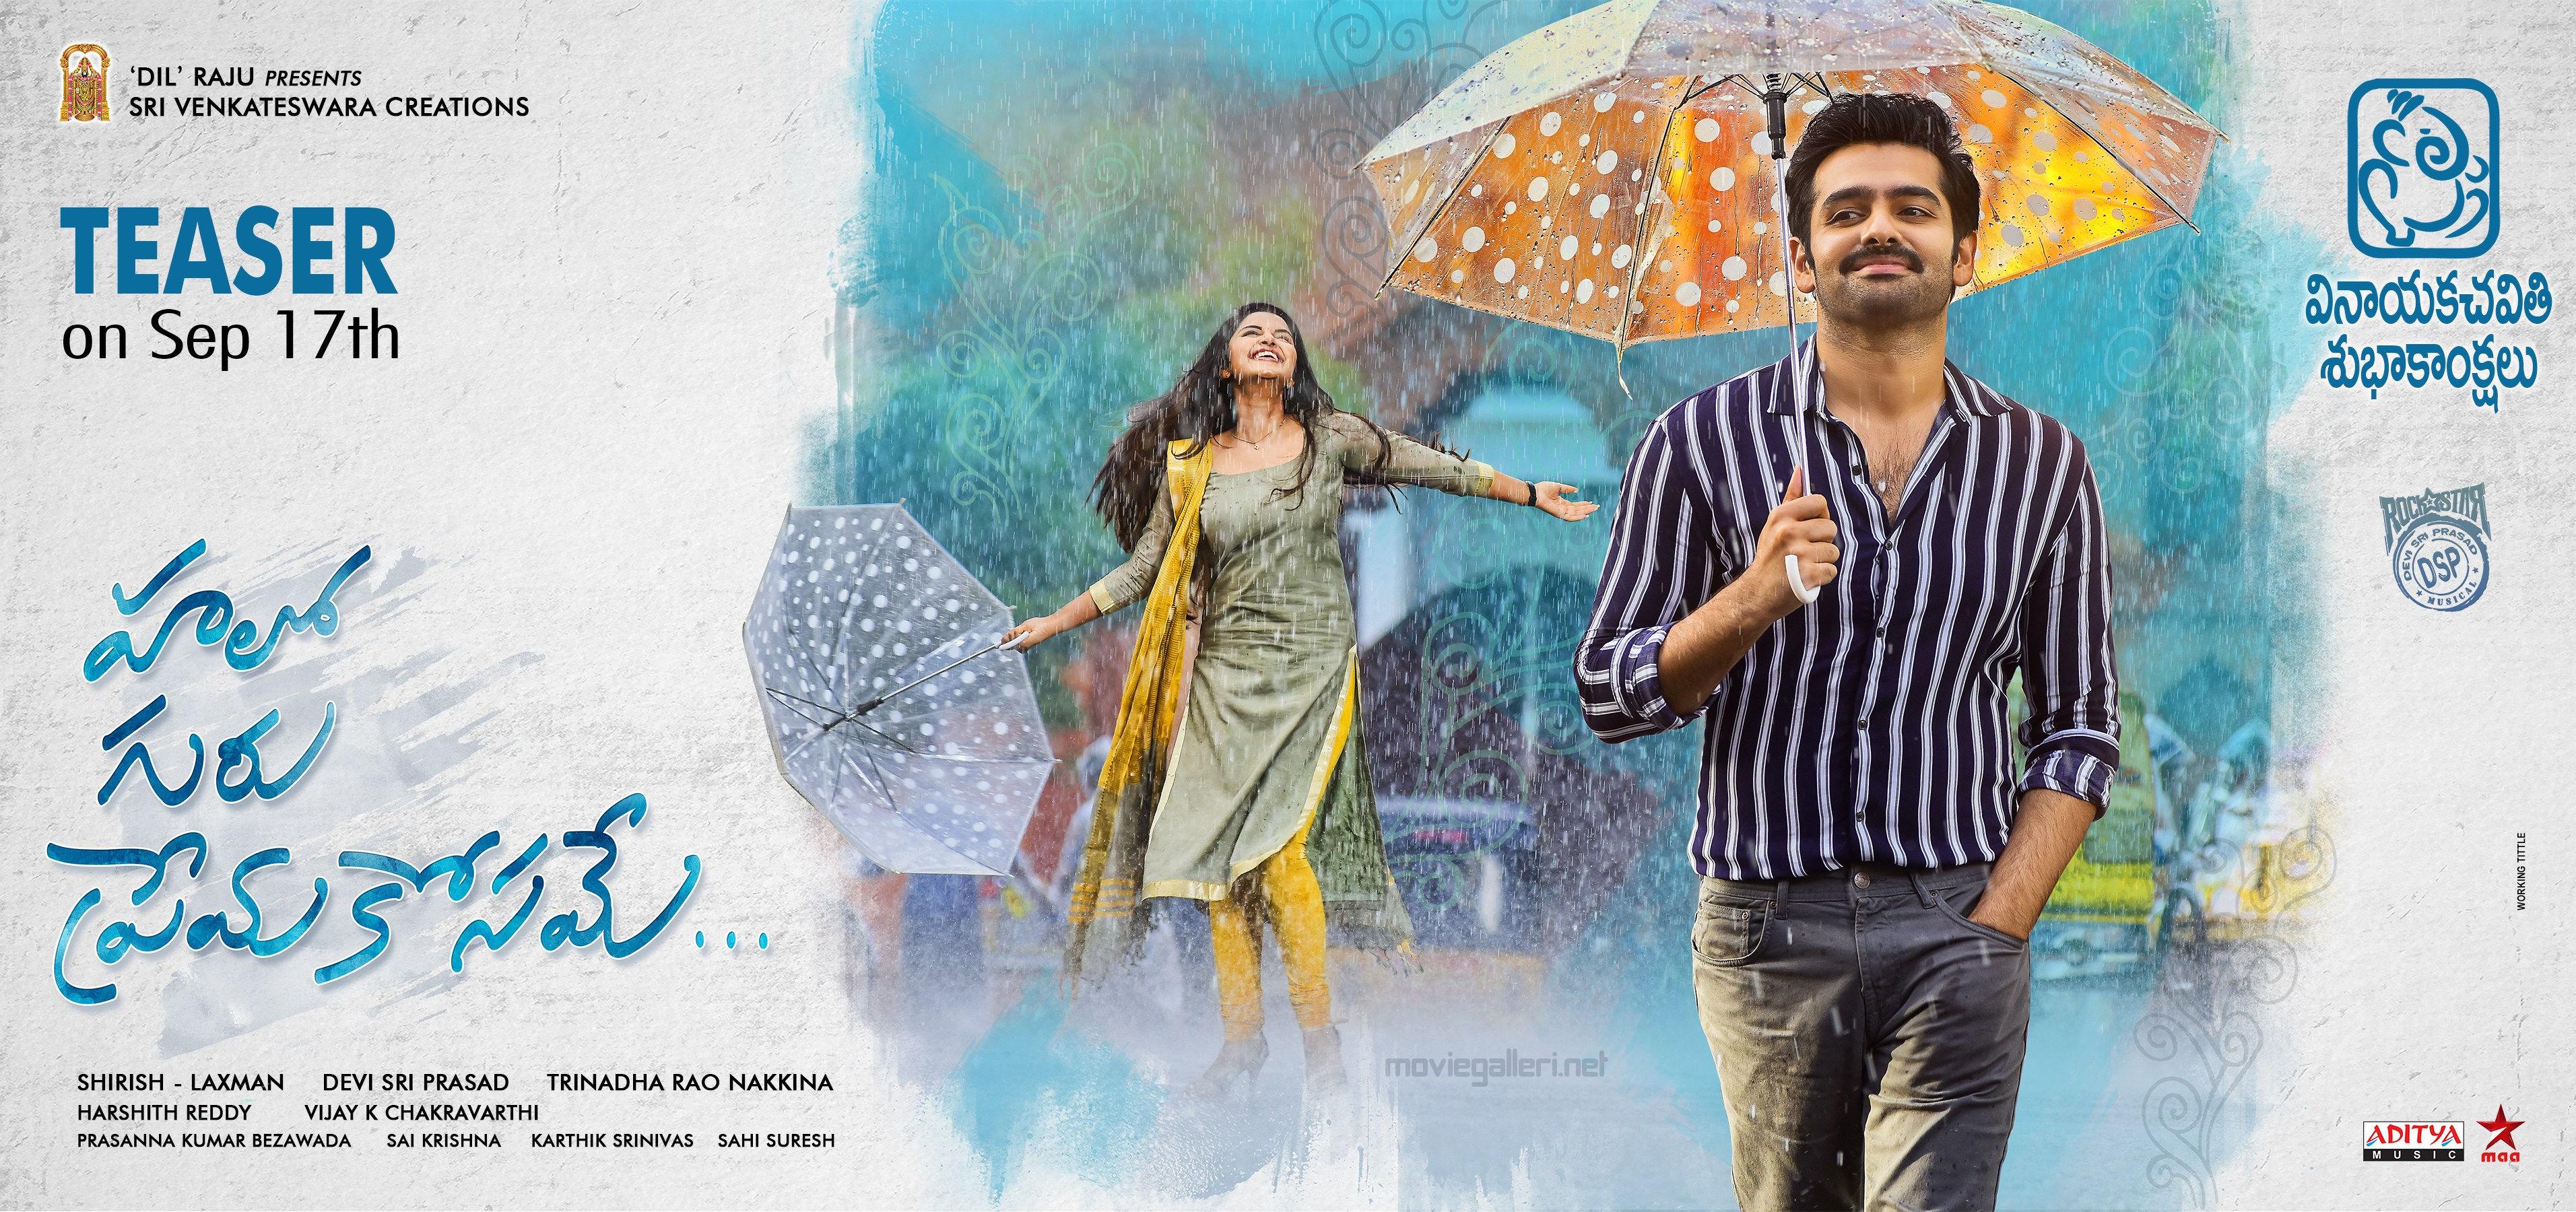 Ram Anupama Parameswaran Hello Guru Prema Kosame Movie Teaser Release Date Sep 17th Poster HD